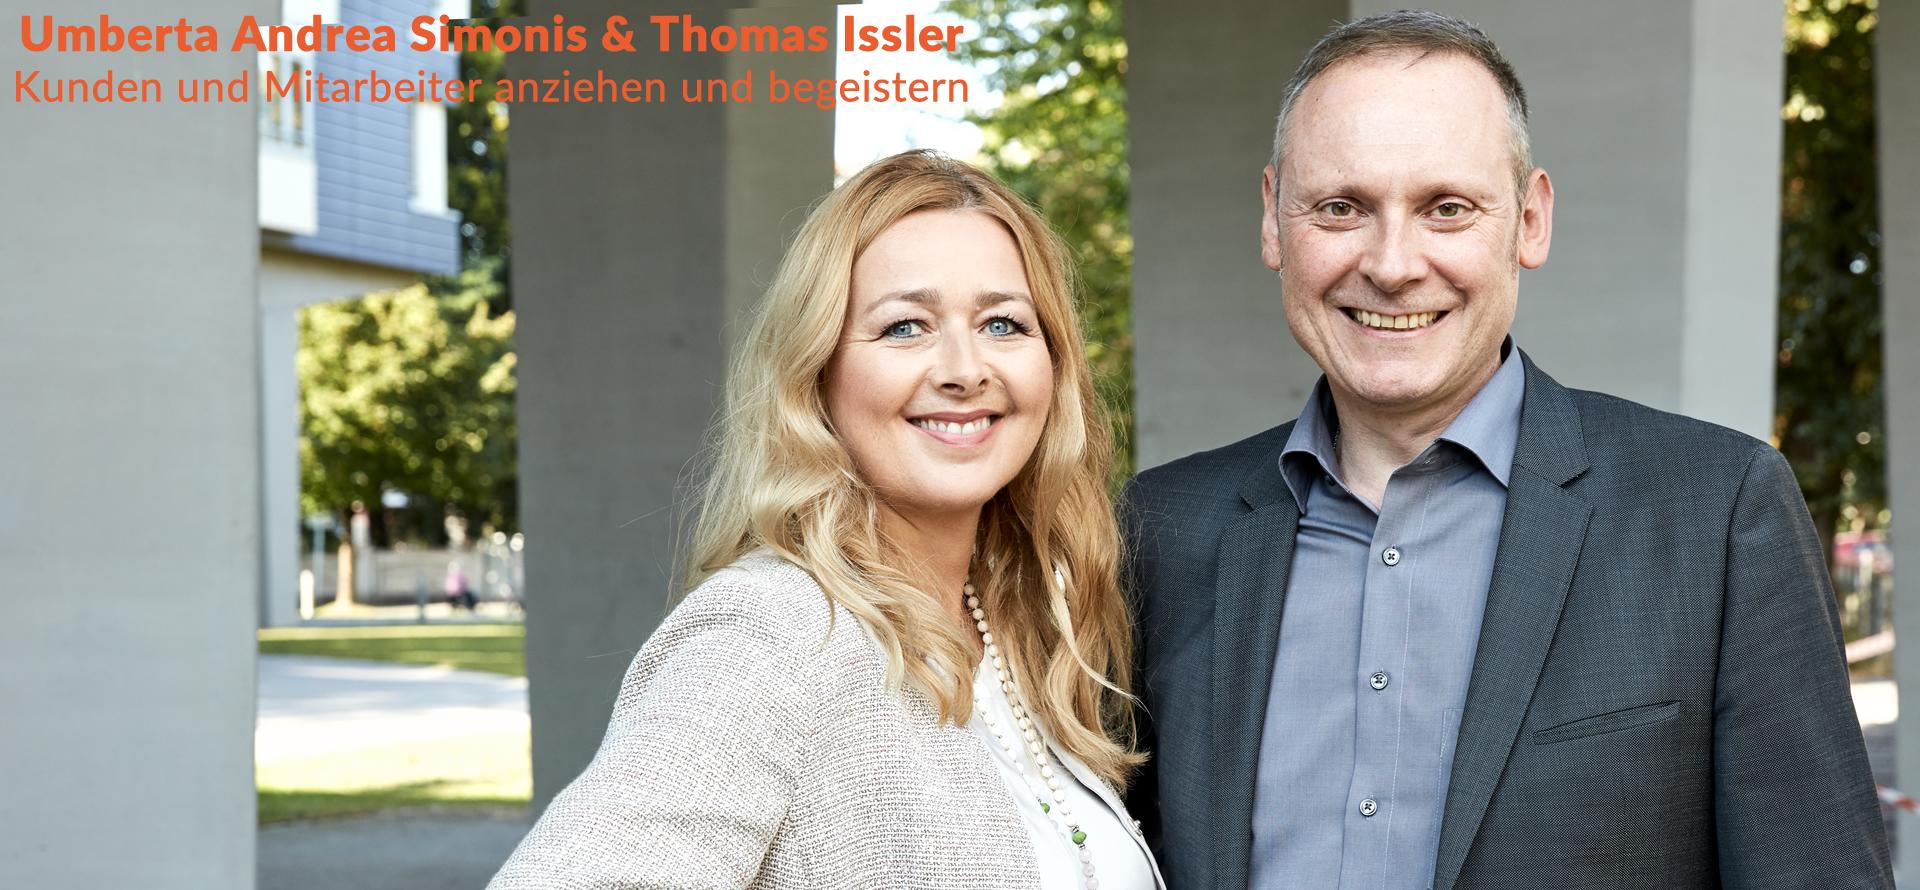 Umberta Andrea Simonis und Thomas Issler